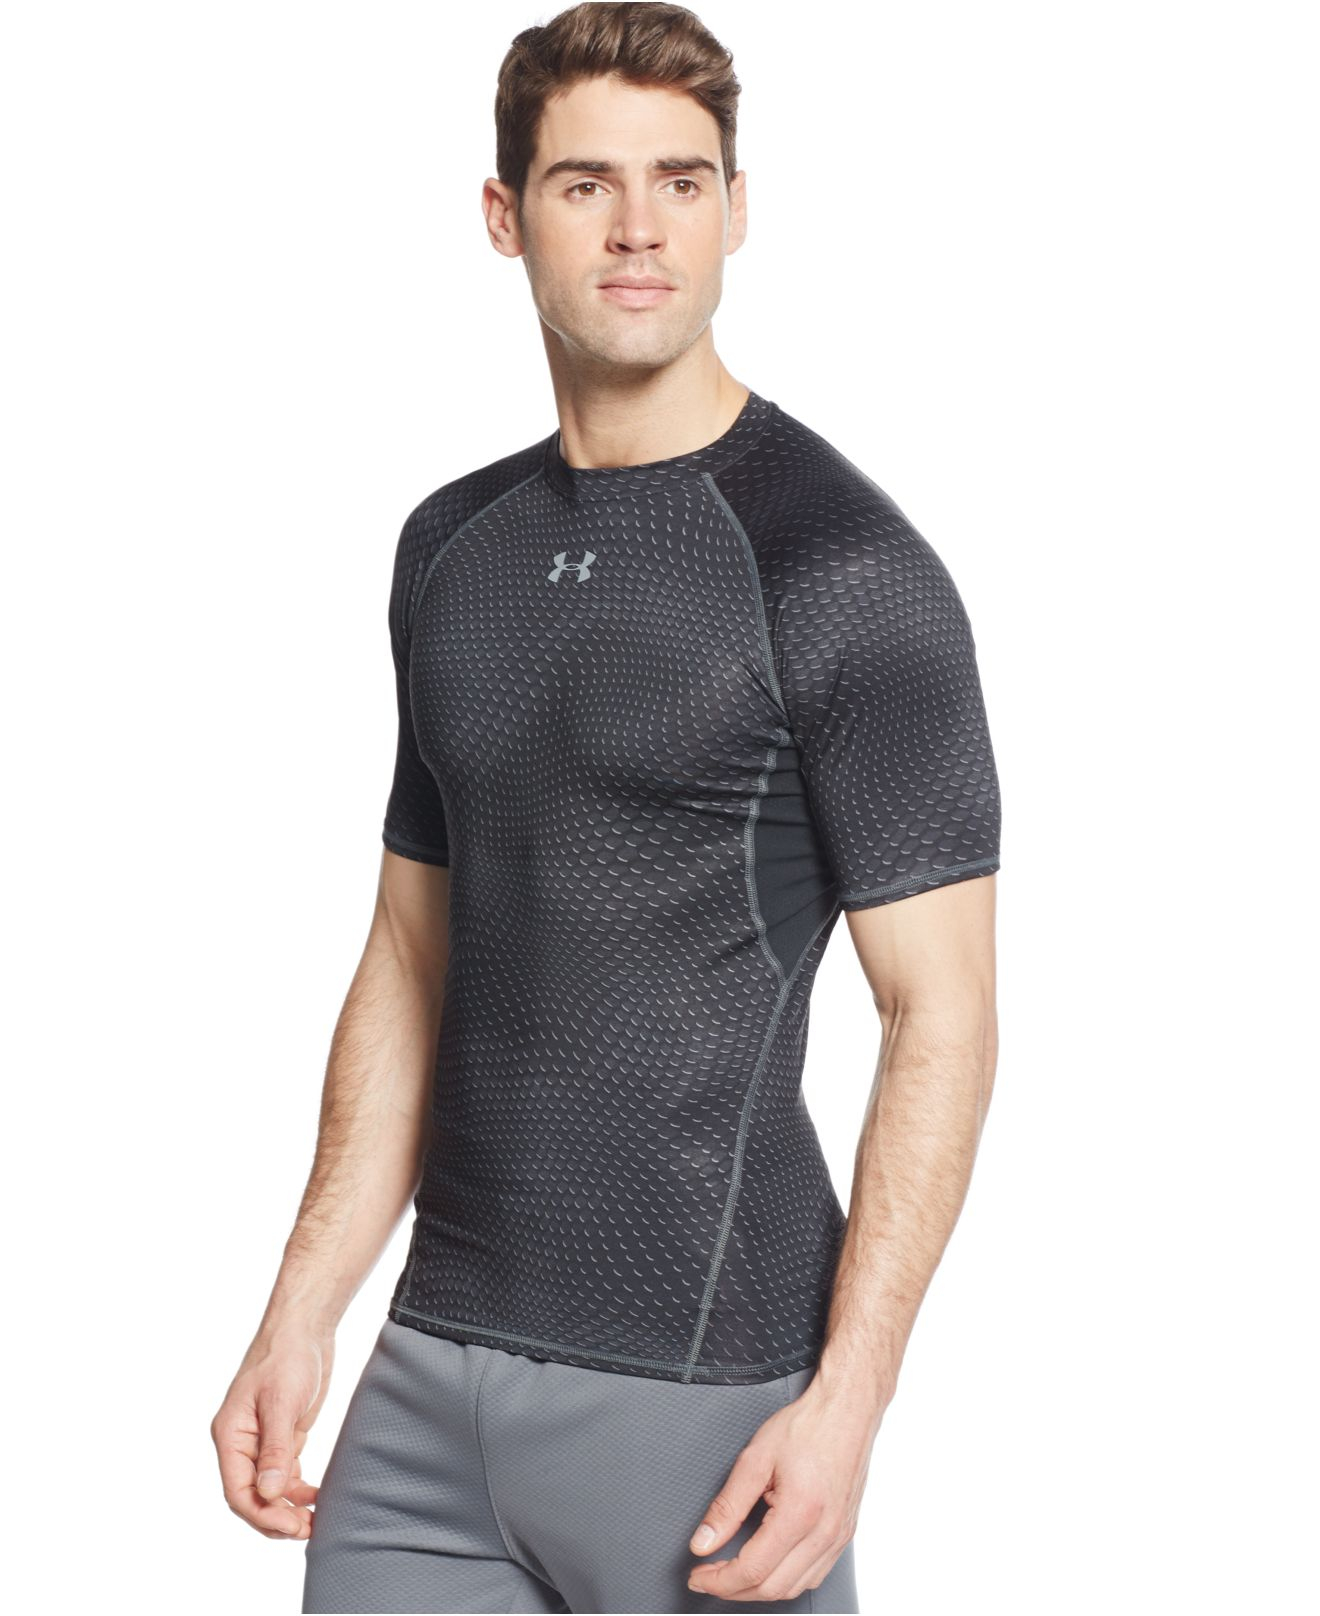 Lyst - Under Armour Printed Heatgear Compression T-Shirt in Black ... 18b32cf4502c